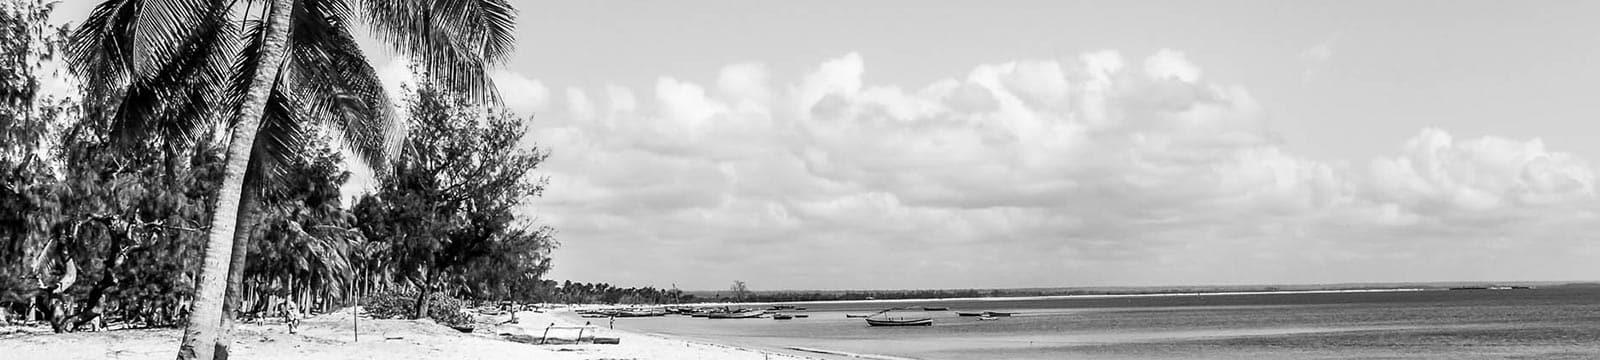 Mozambique beach tree line